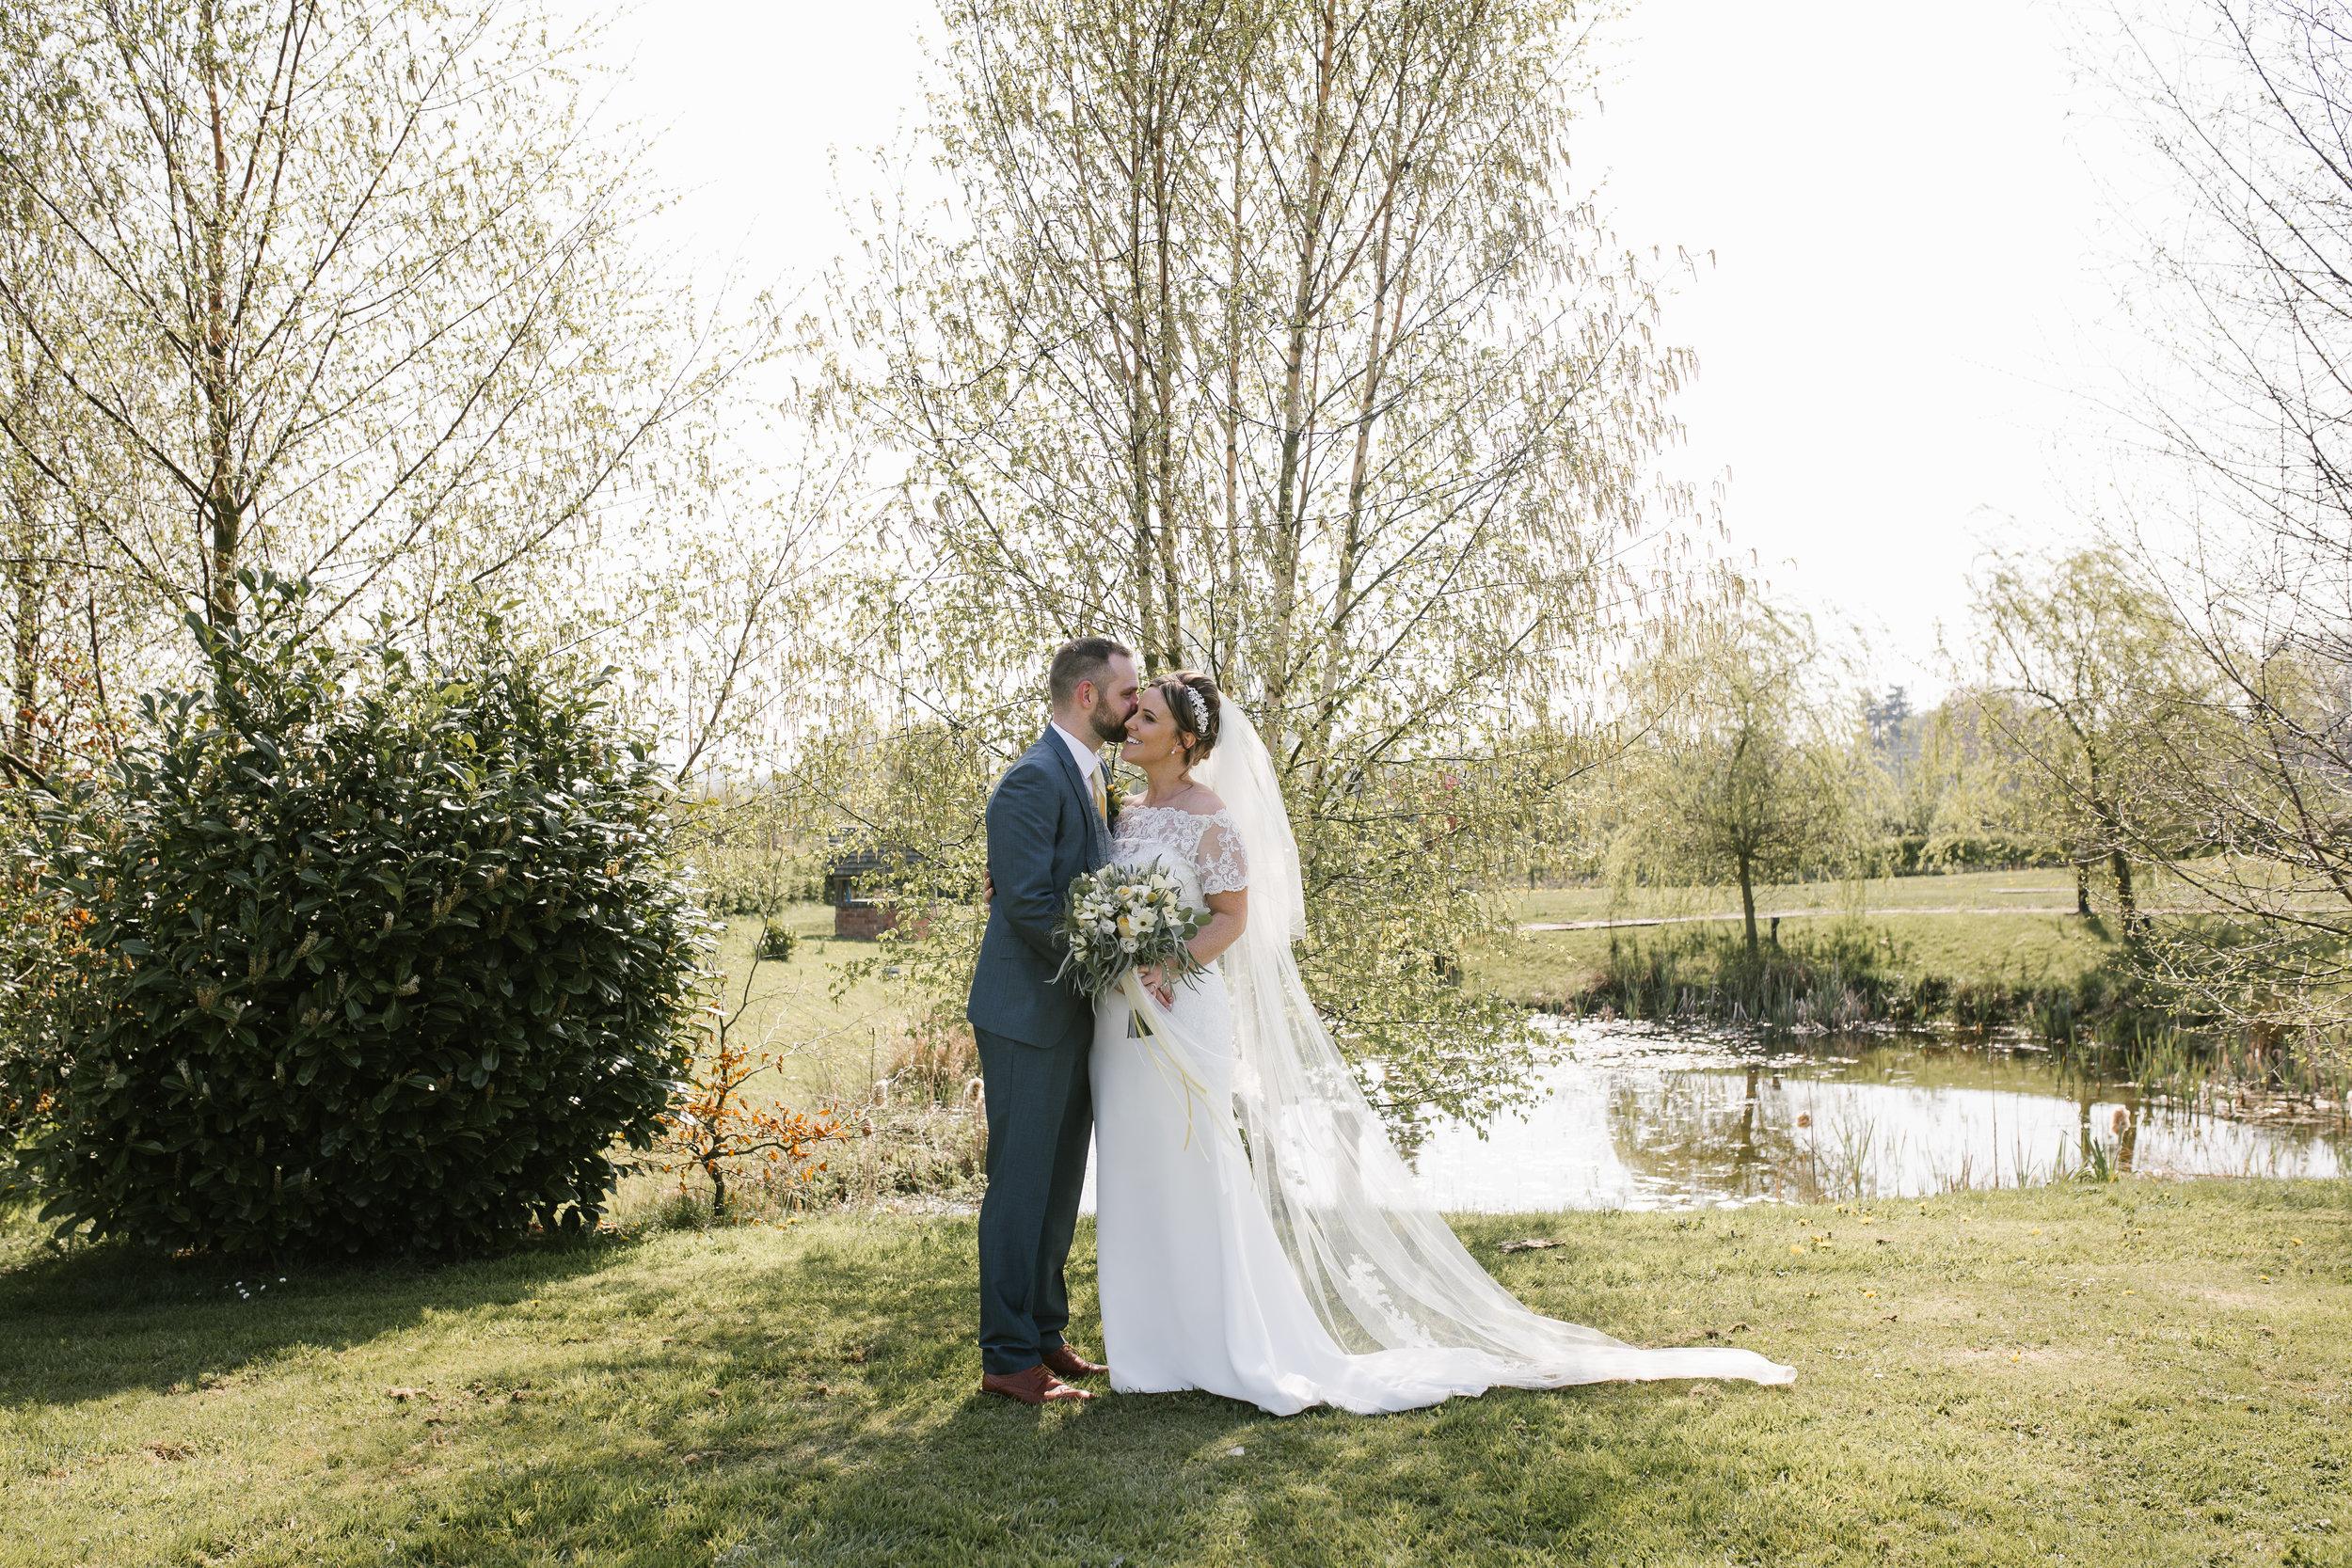 groom whispering into his brides ear at aston marina boat house wedding venue